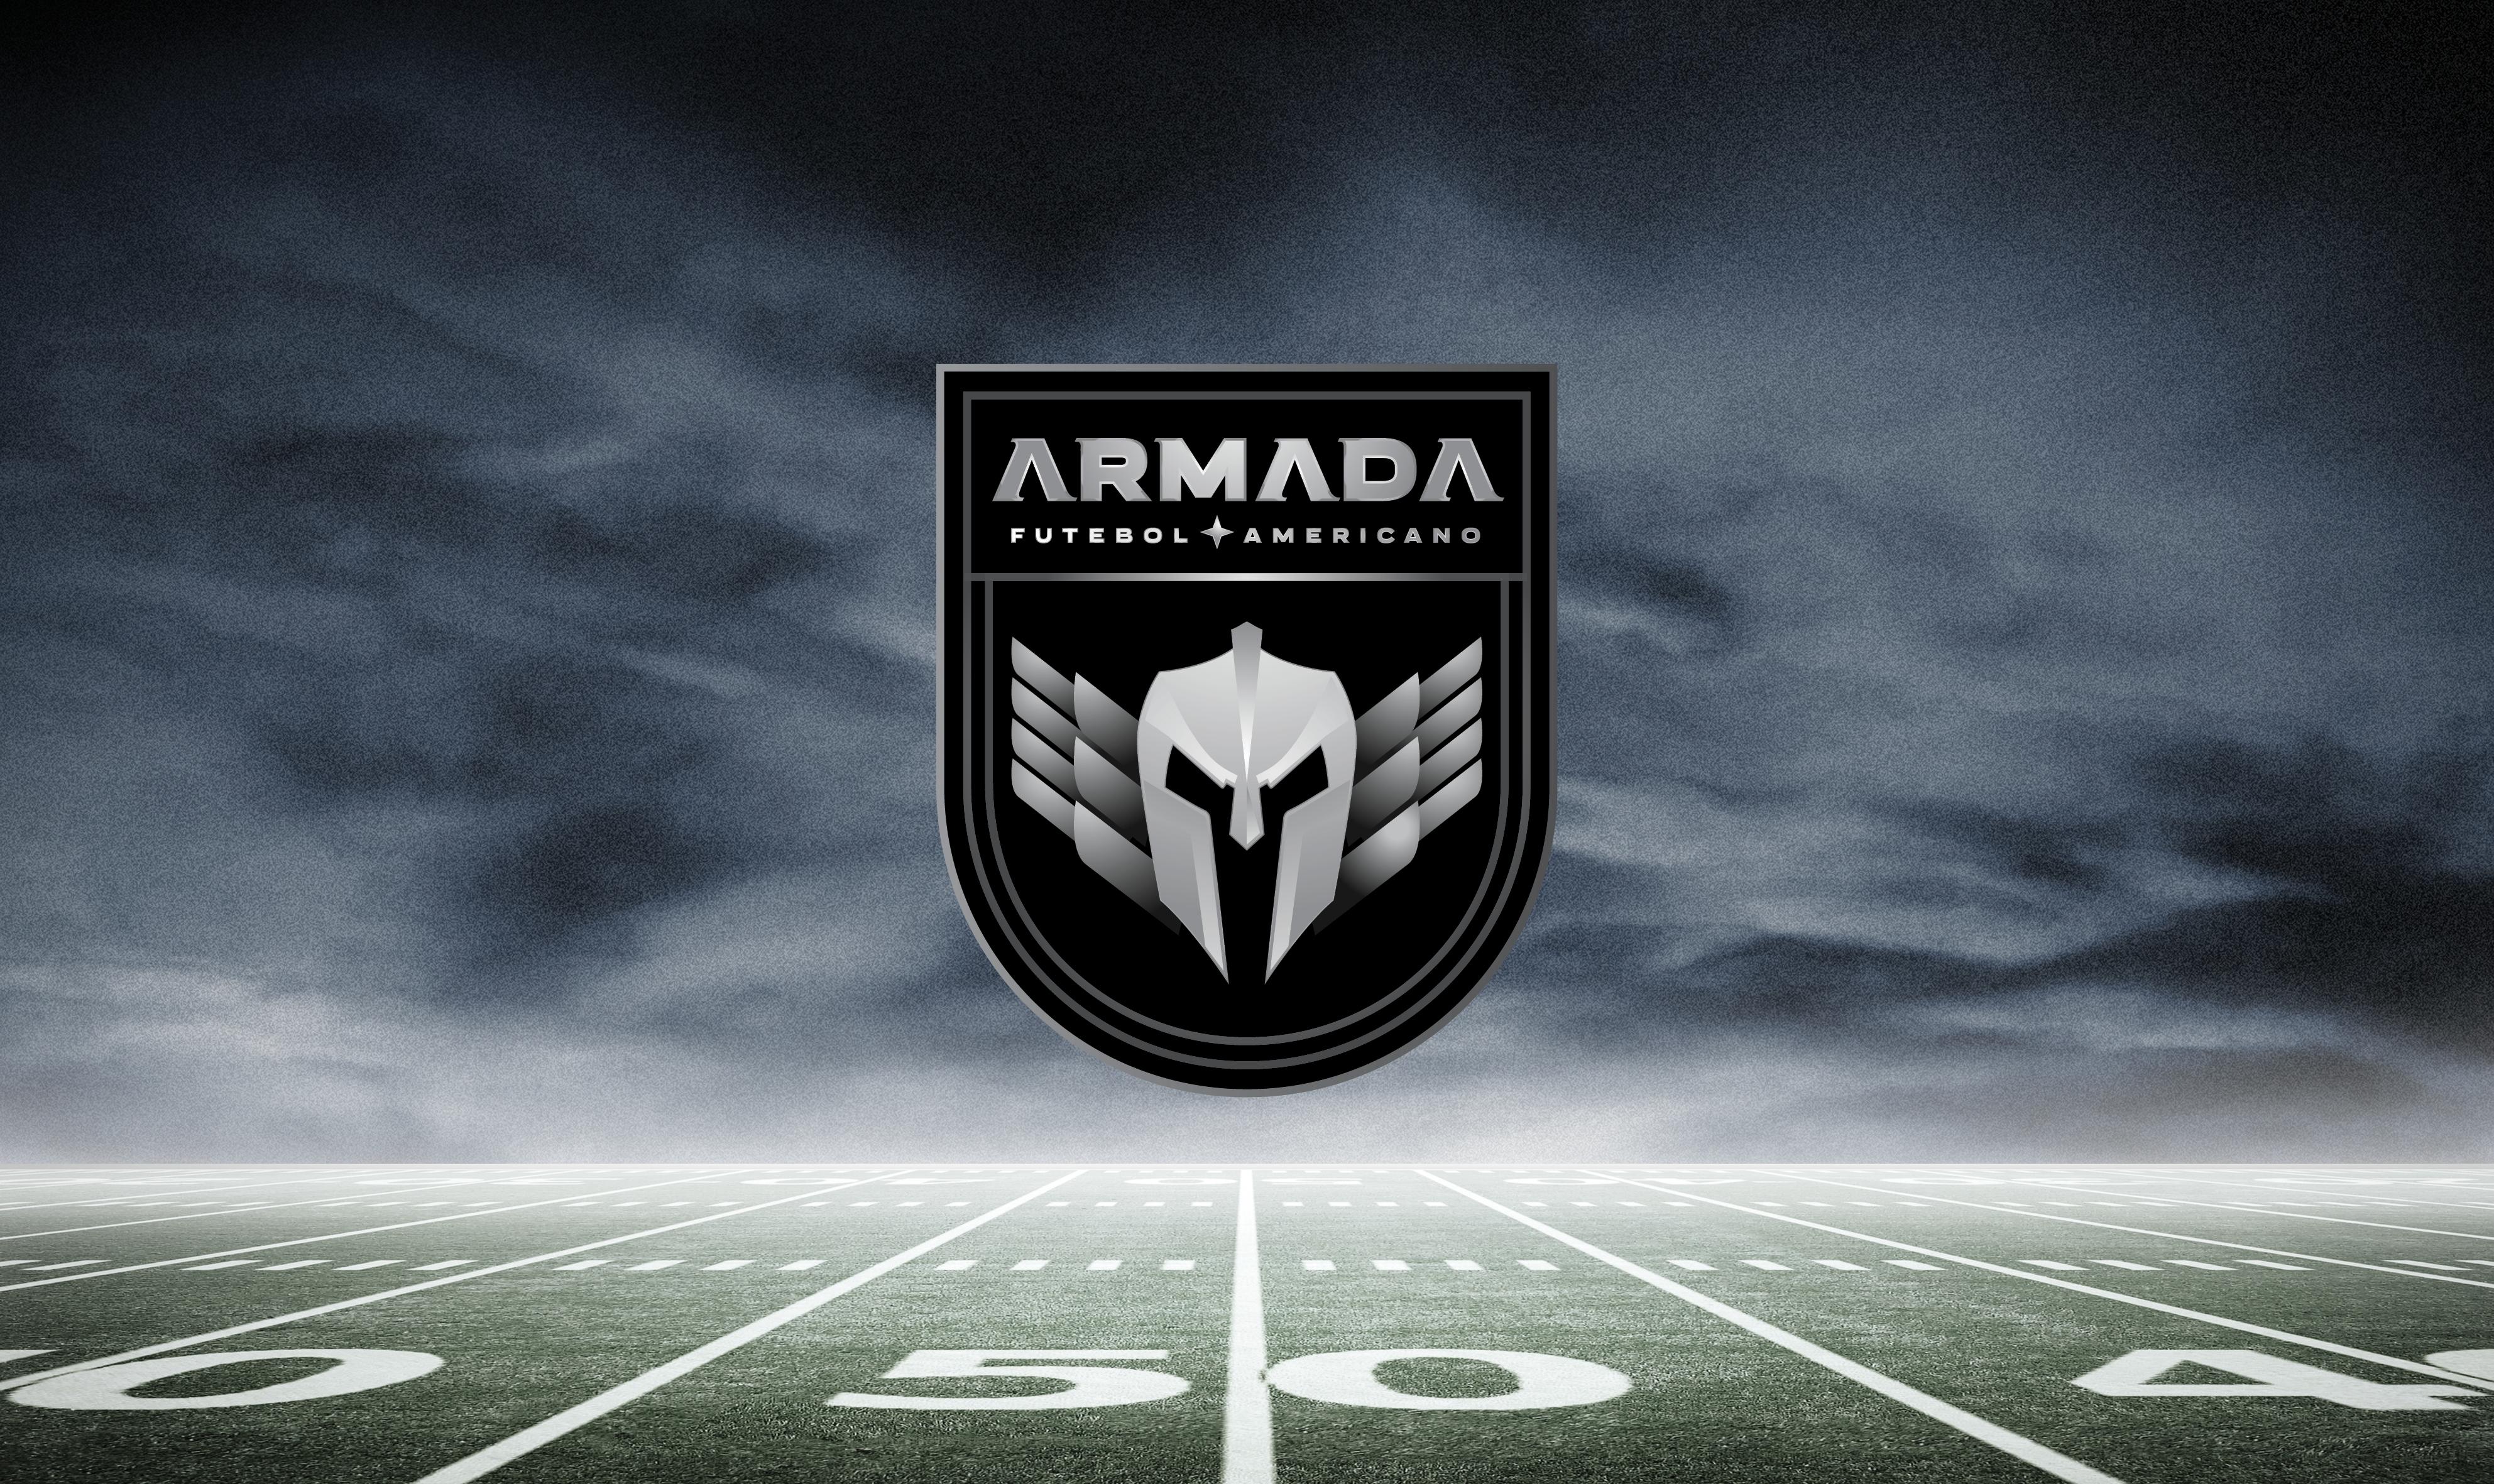 201710 Armada Futebol Americano - Projeto desenvolvido por Nacione9